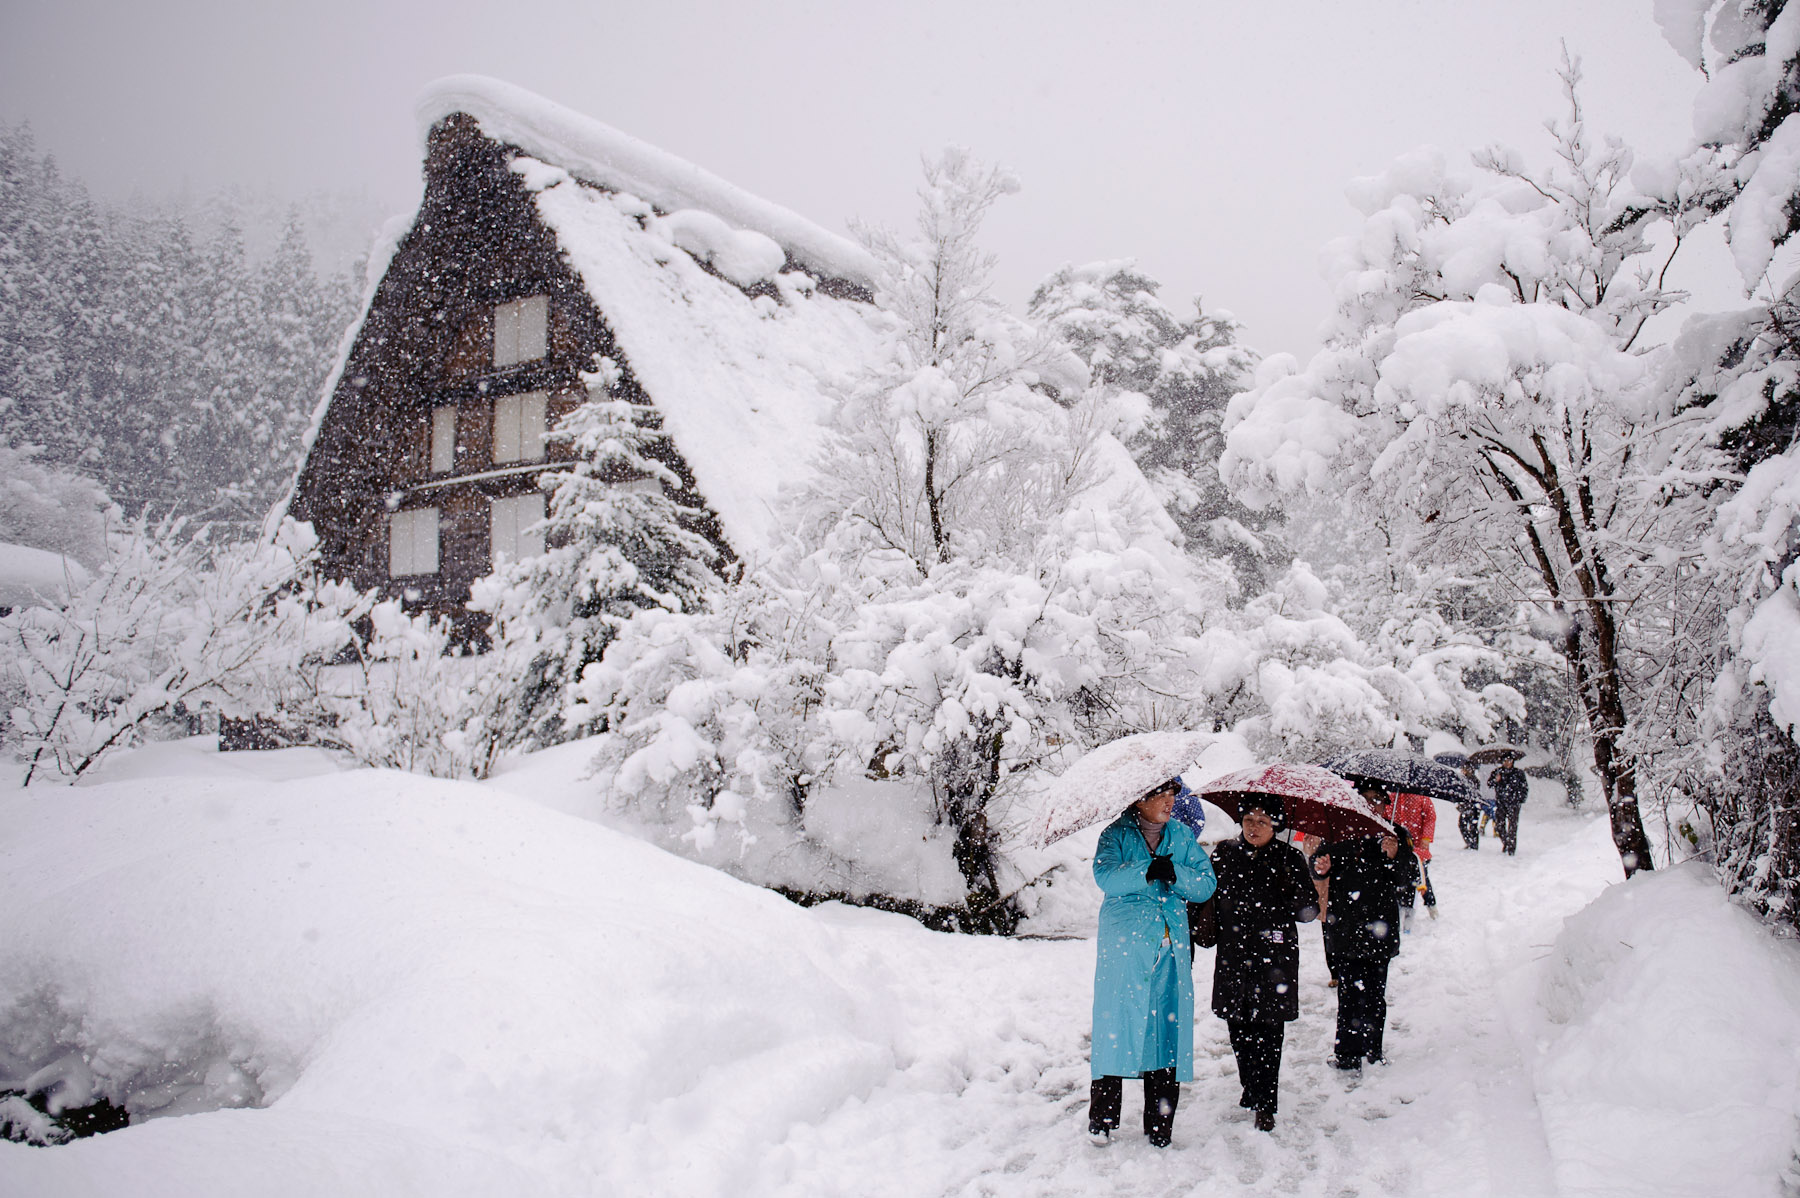 Jeffrey Friedl S Blog 187 First Look At Snowy Shirakawago